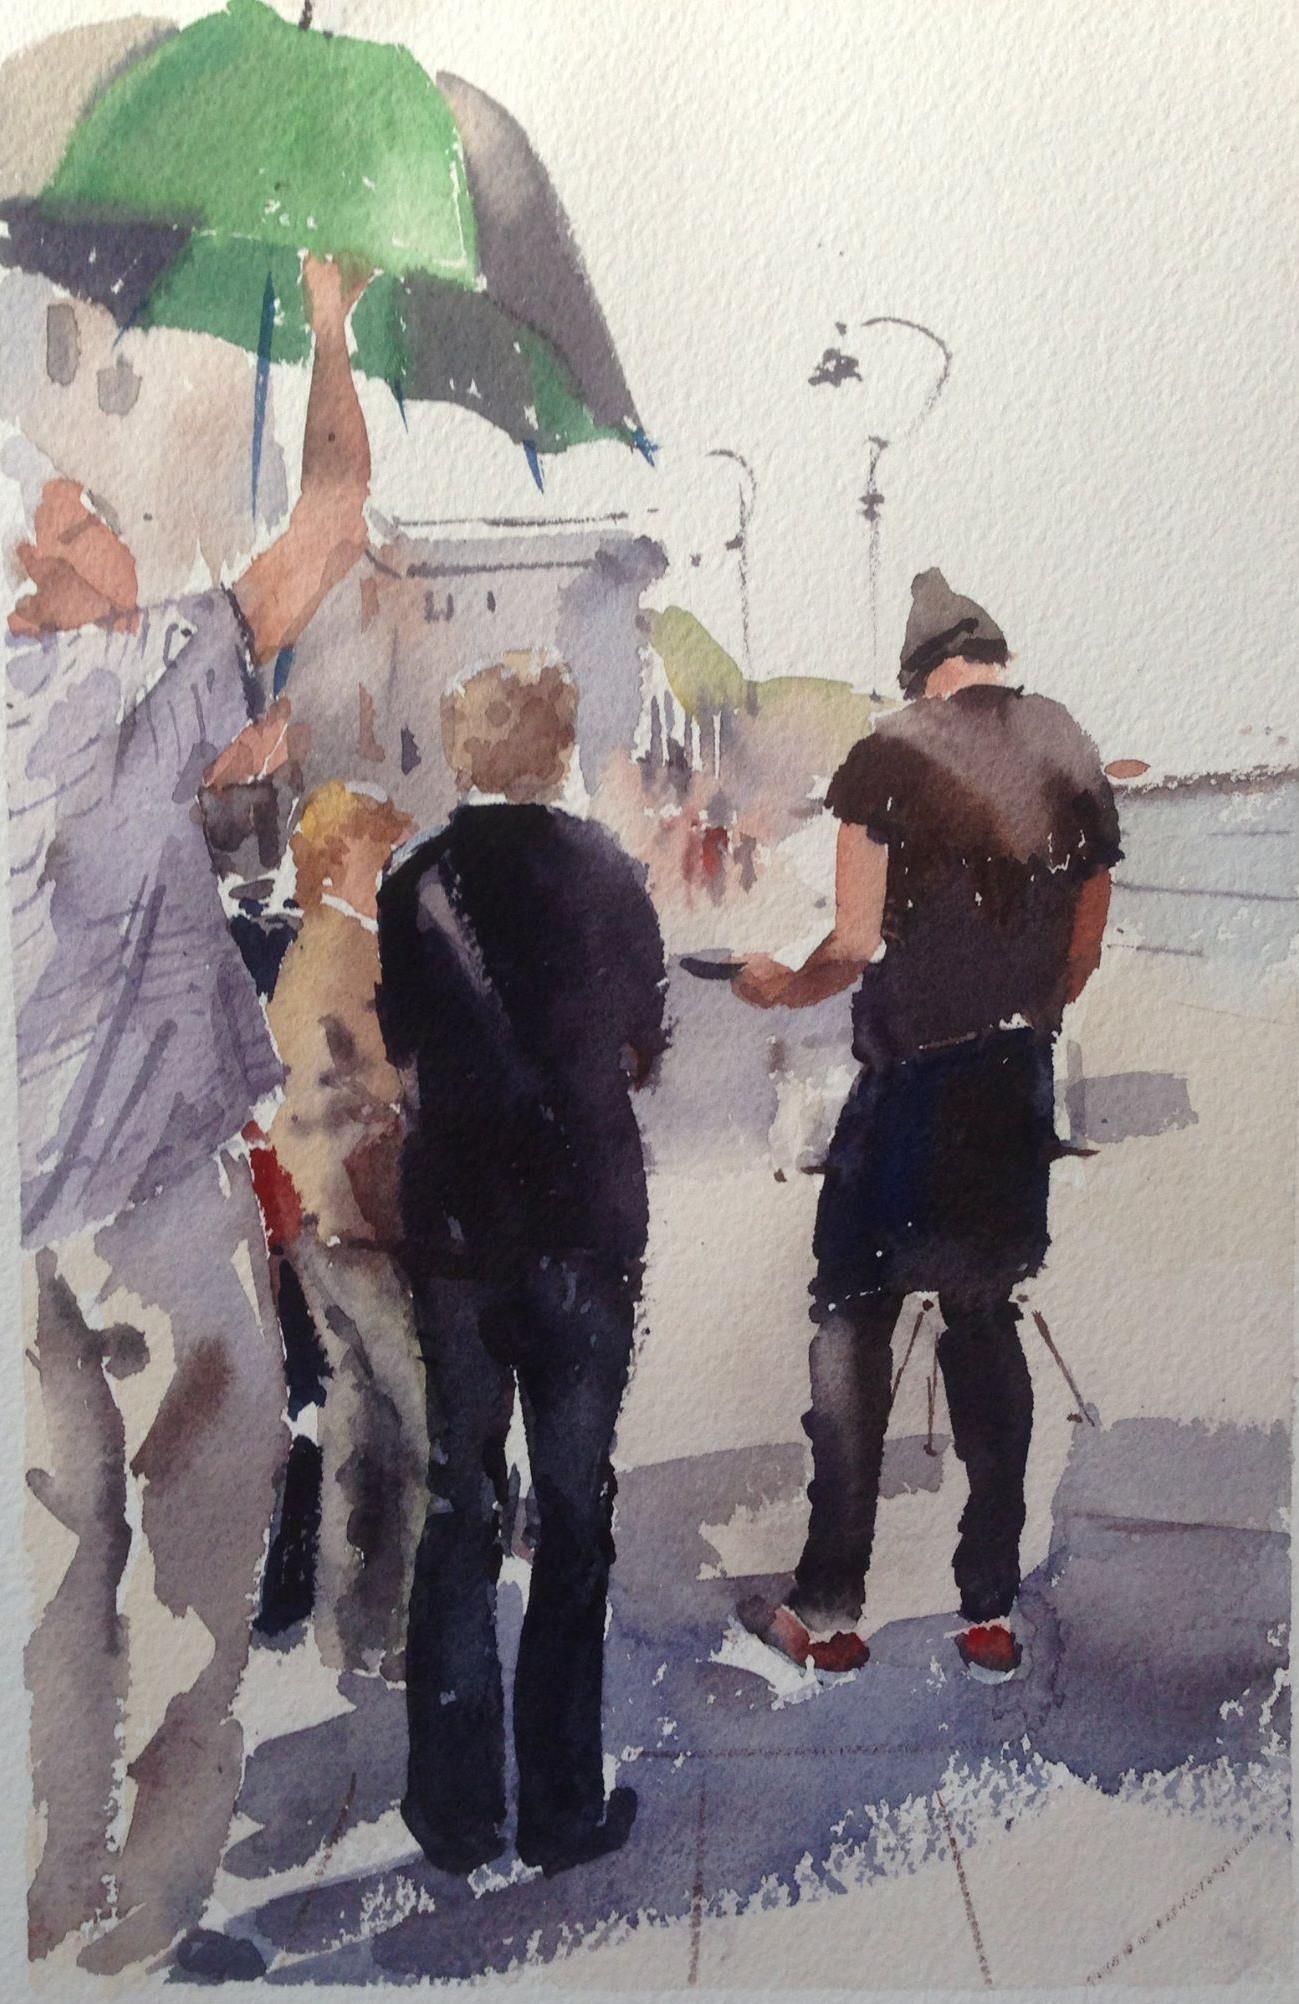 Watercolor artist magazine palm coast fl - Galina Gomzina Alvaro Castagnet Workshop In England